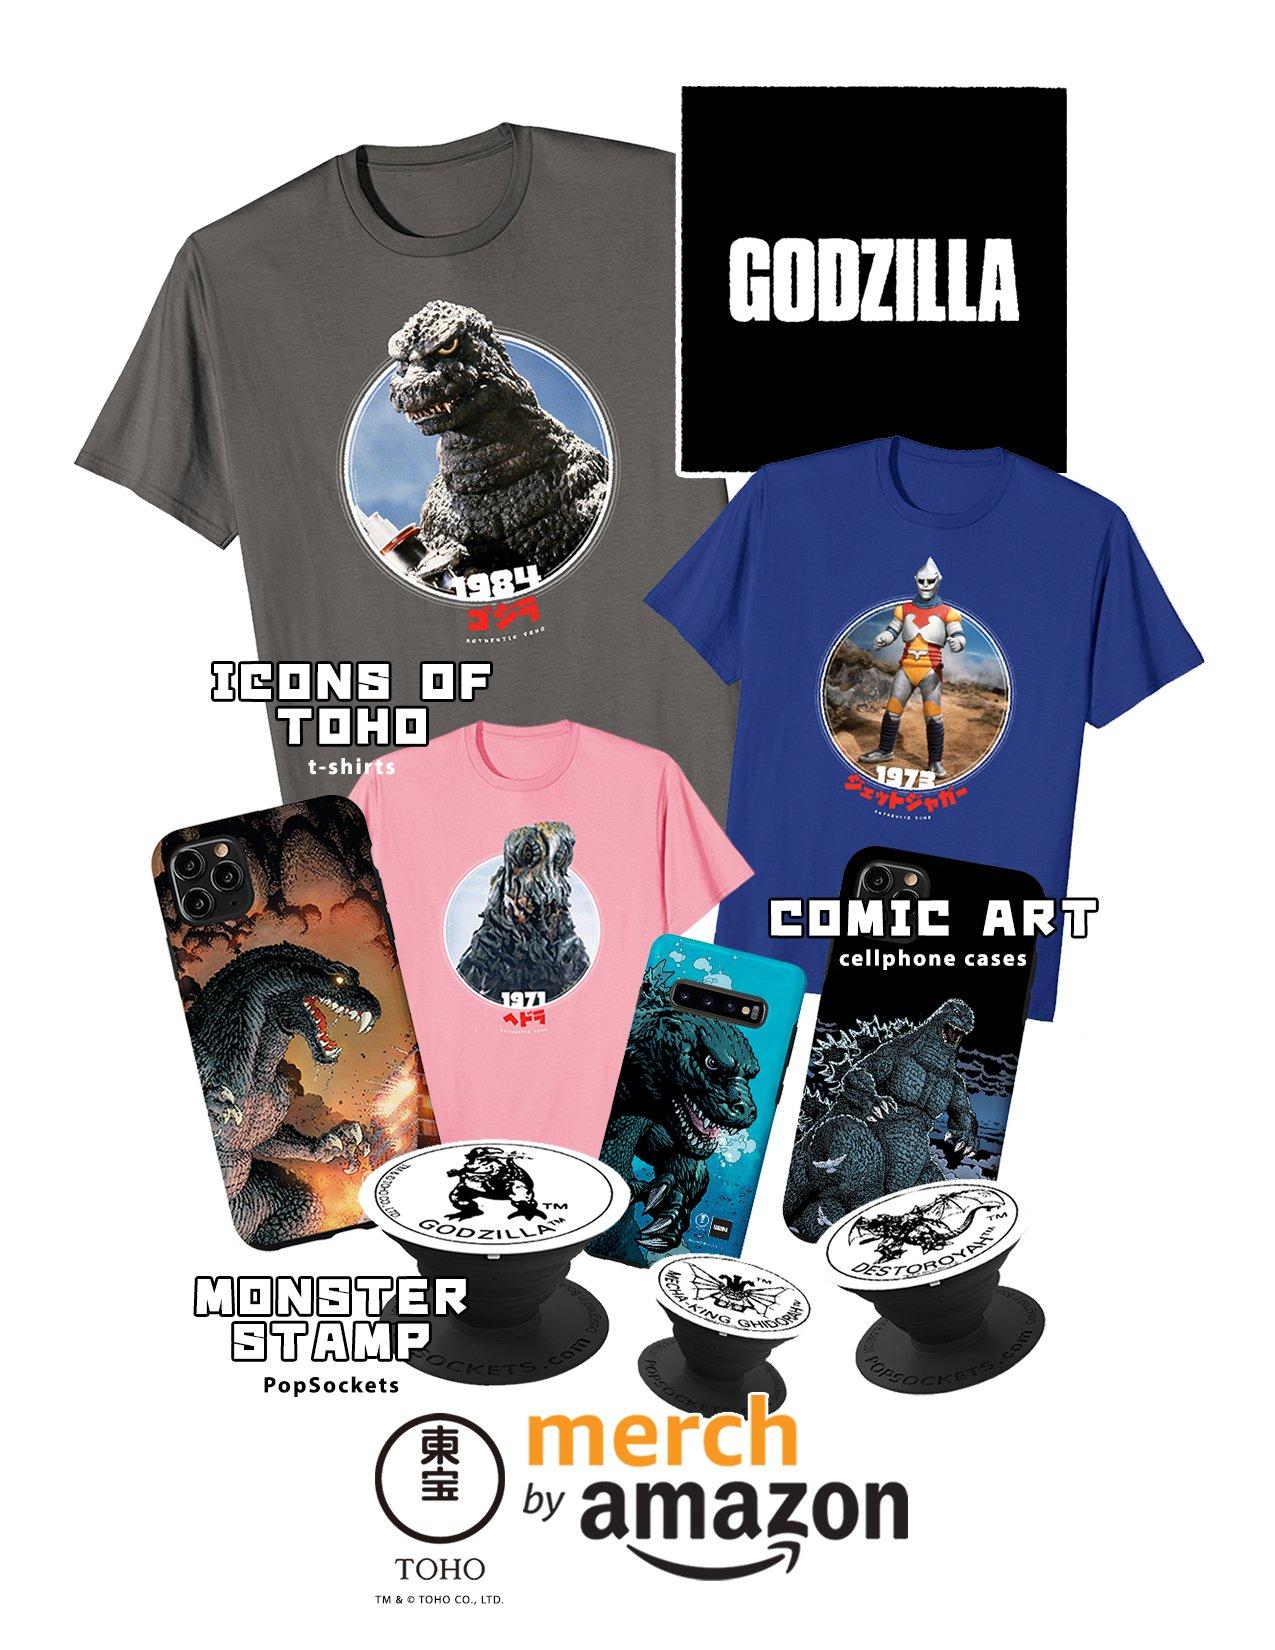 Godzilla, Amazon